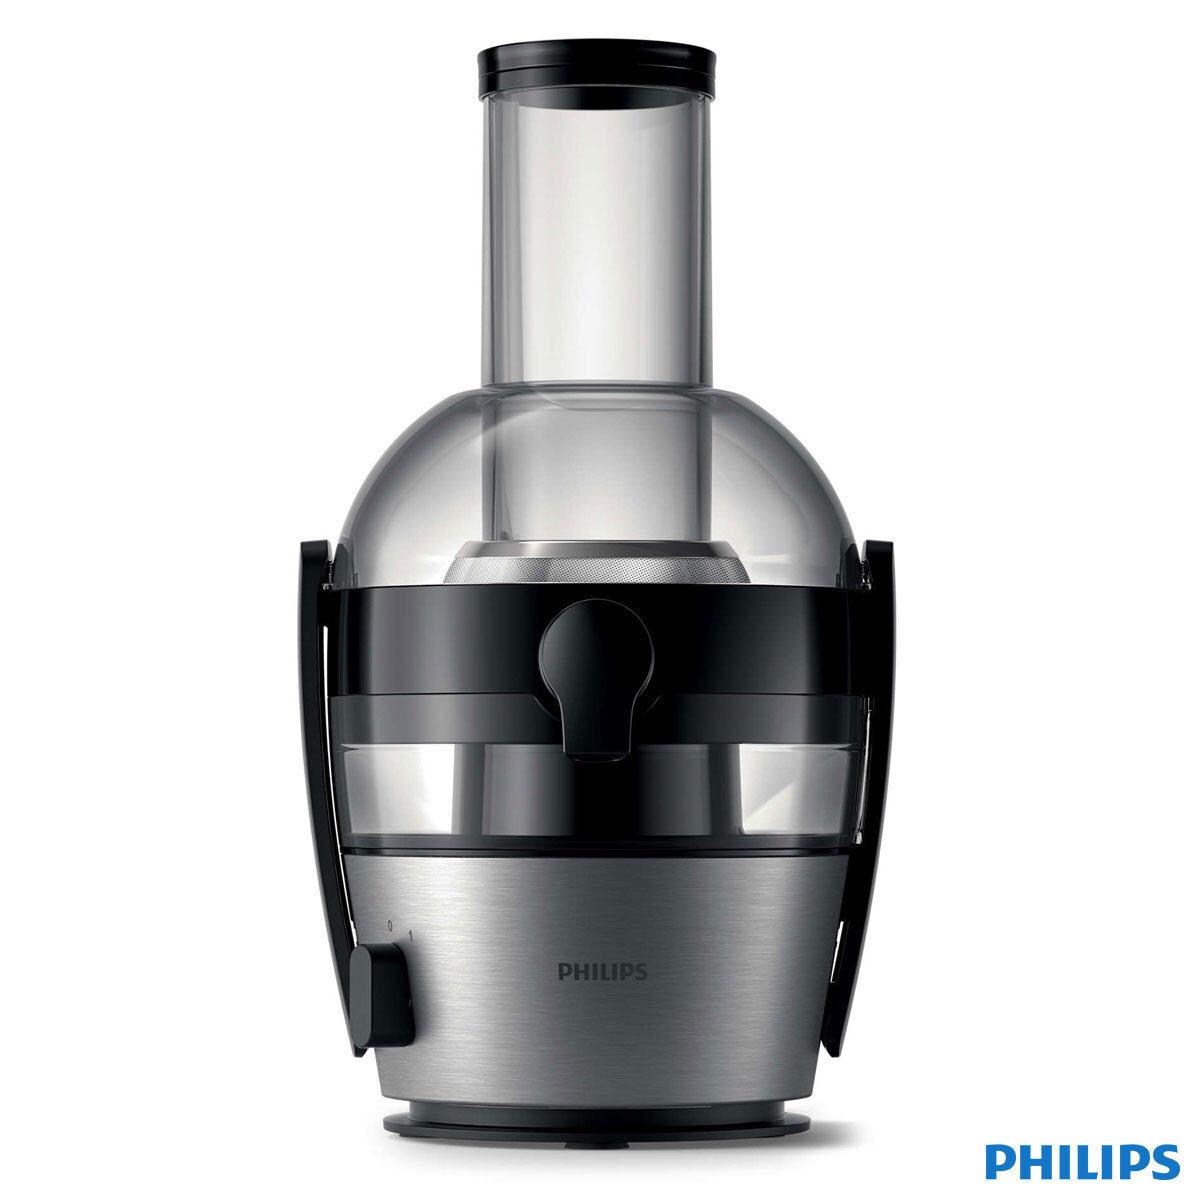 Philips HR183601 Viva Collection